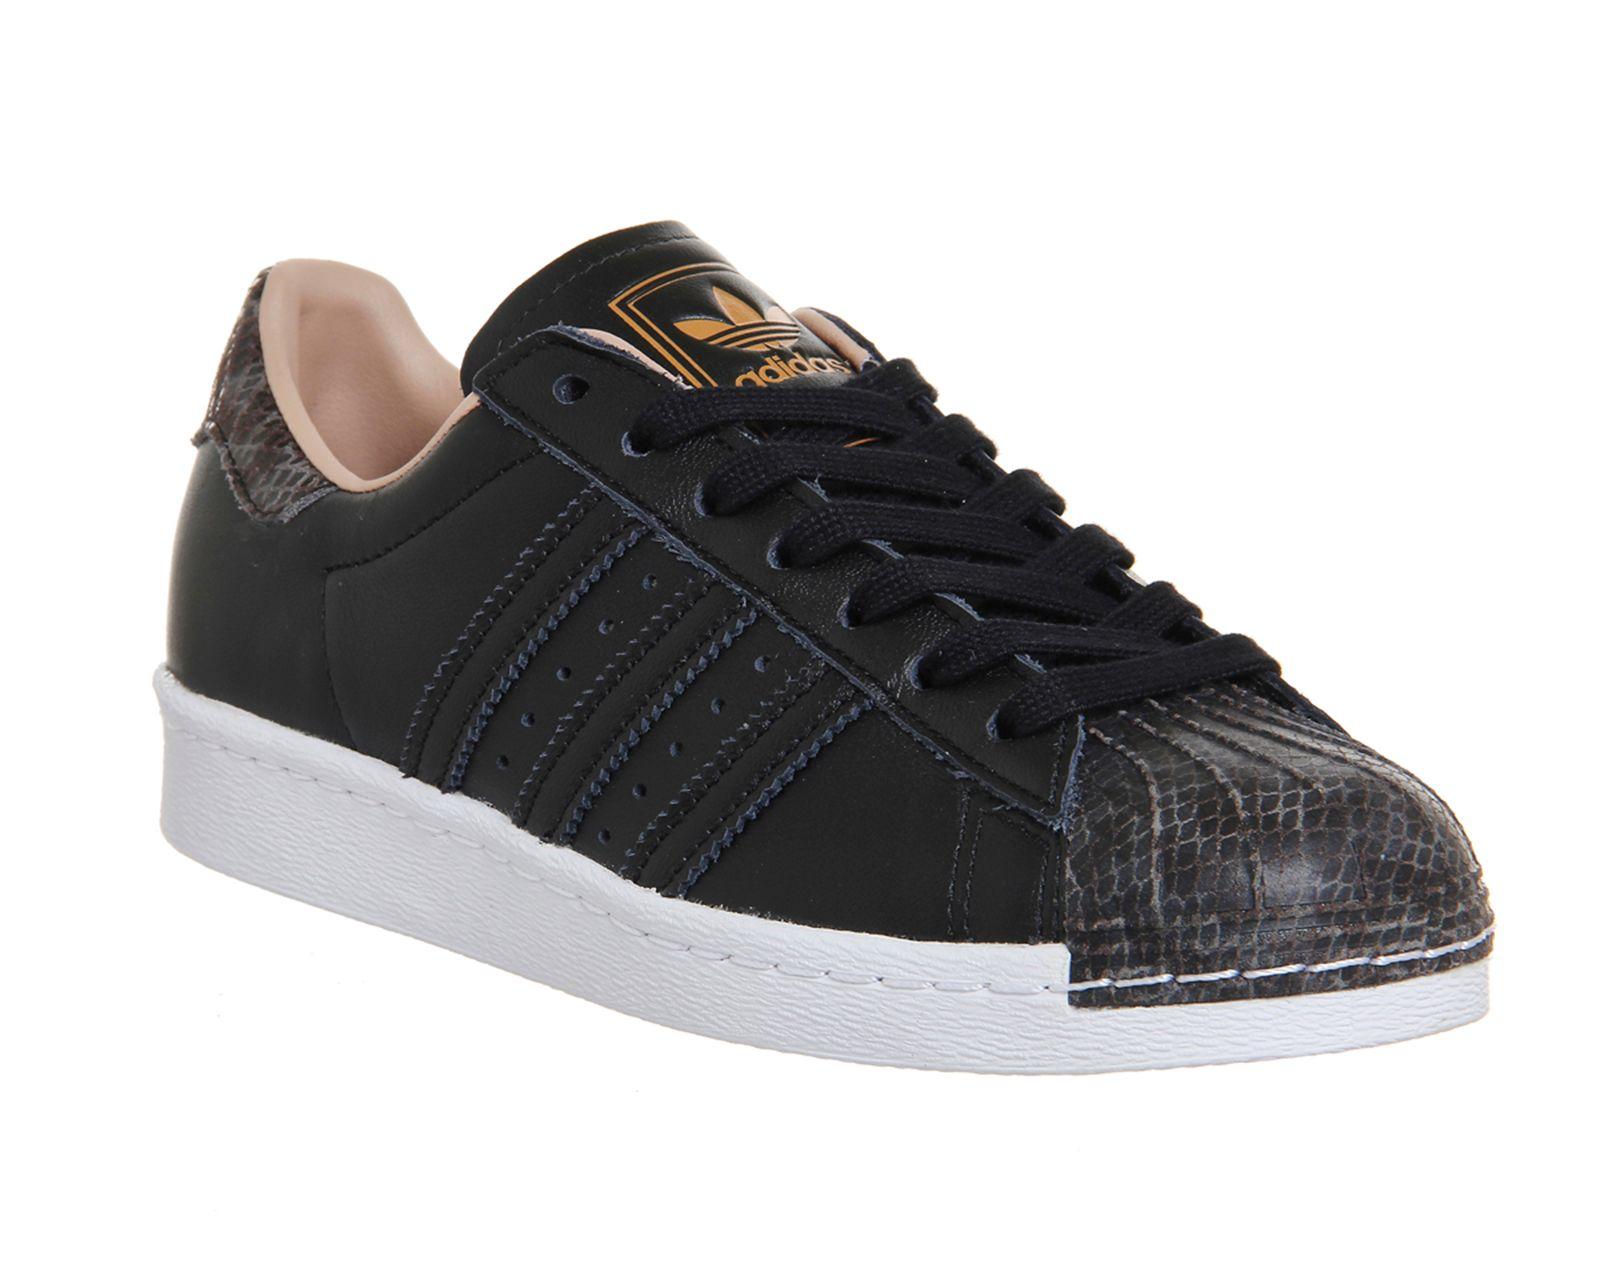 adidas Originals Superstar 80s Leather Trainers in Black